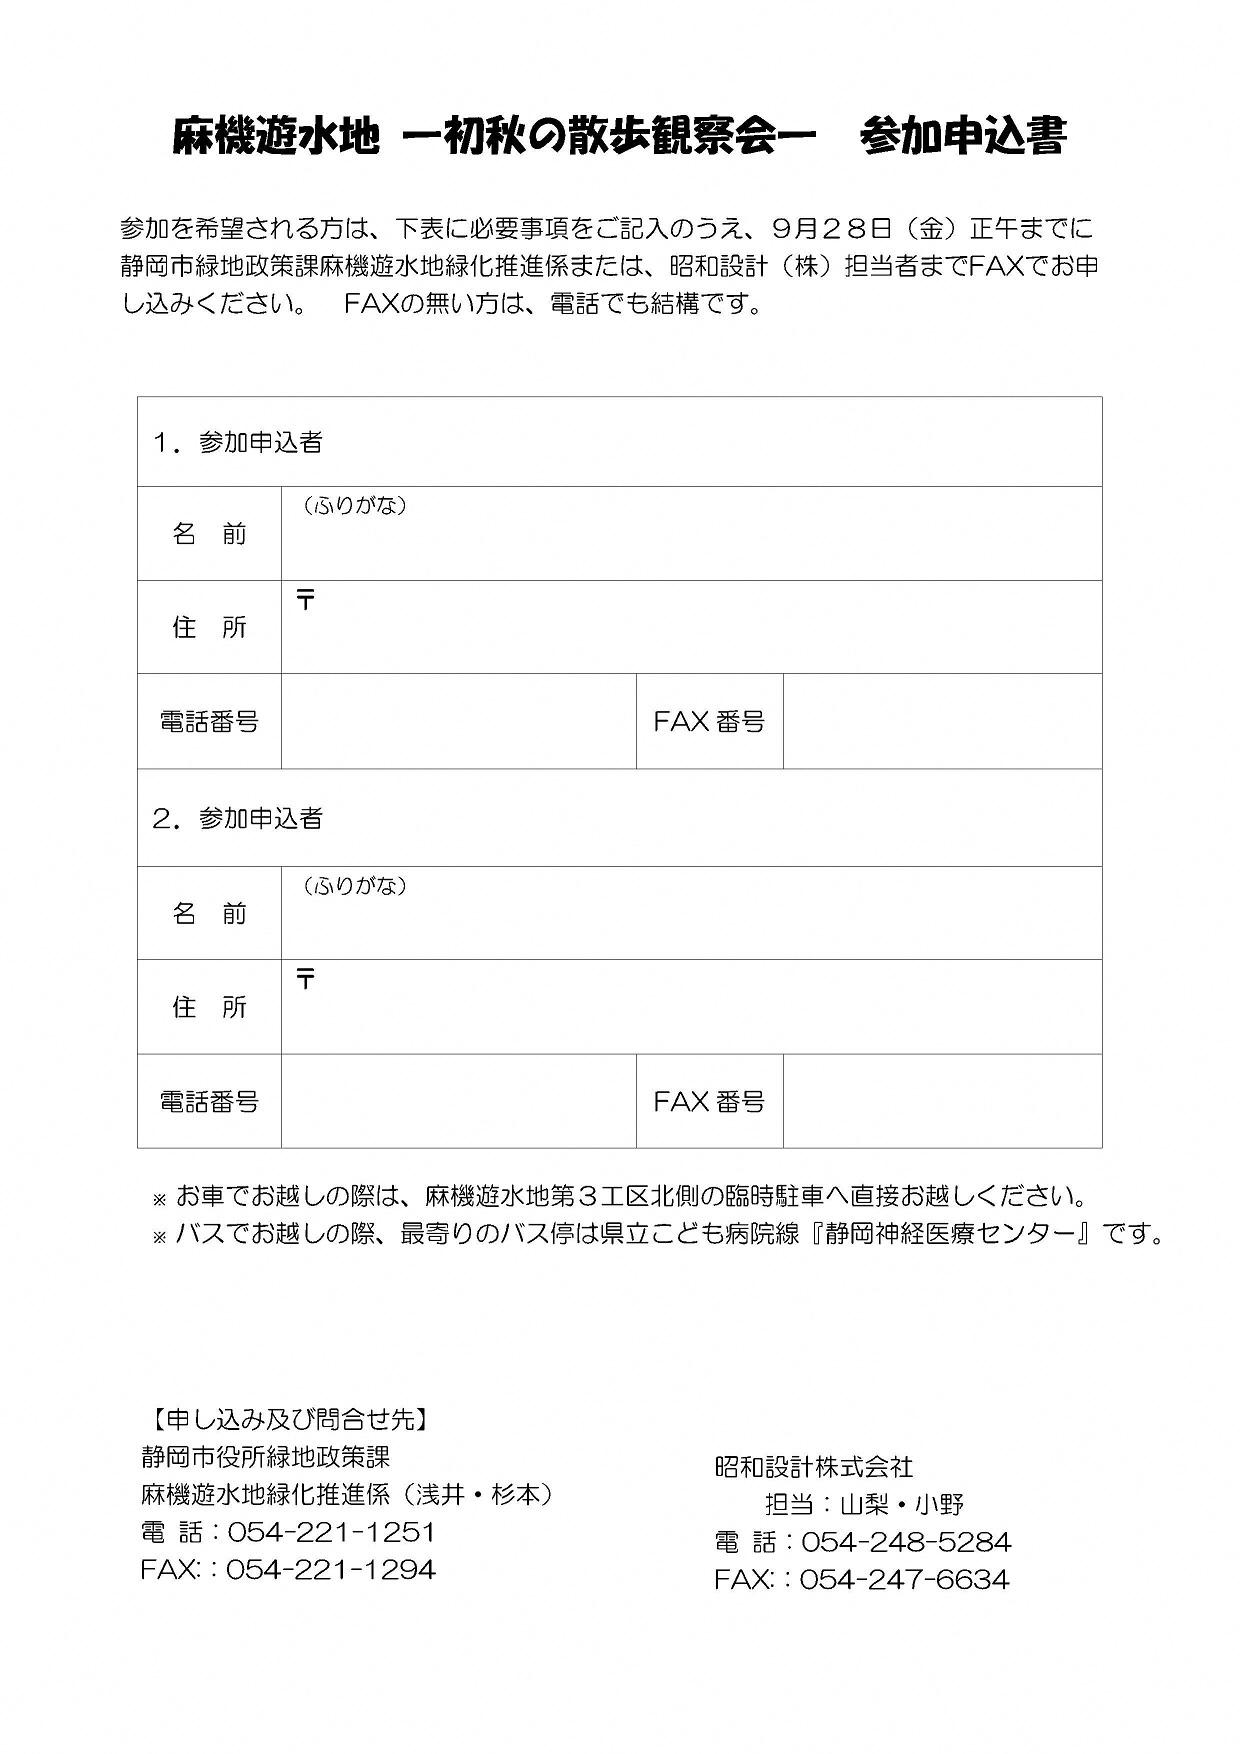 http://www.shizutan.jp/learning/2018/09/07/images/%E3%83%9F%E3%82%BA%E3%82%A2%E3%82%AA%E3%82%A4%E8%A6%B3%E5%AF%9F%E4%BC%9A-2.jpg